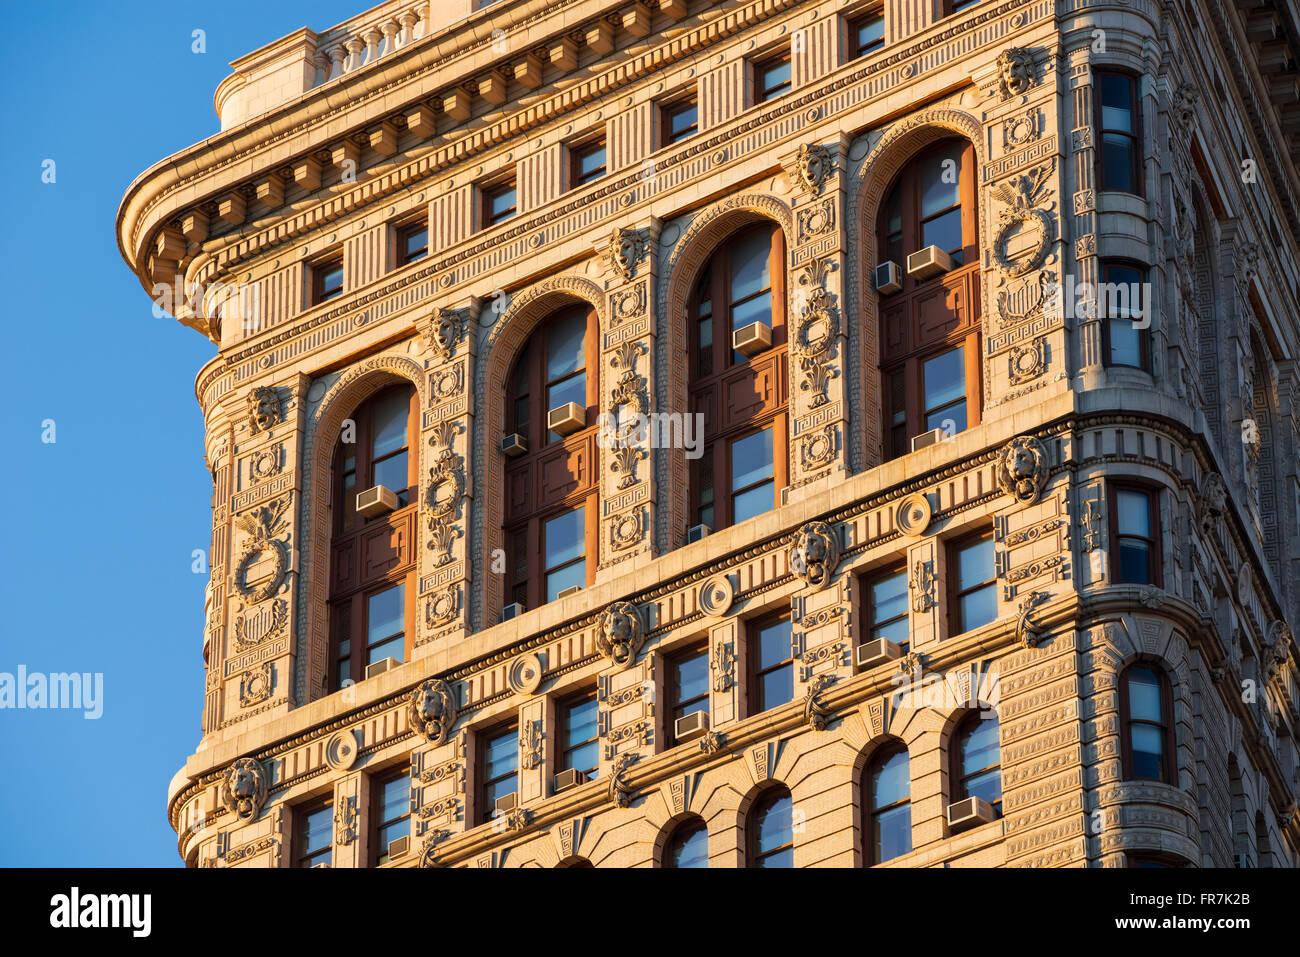 Edificio Flatiron (estilo Beaux-Arts) fachada sur al atardecer lucimiento intrincados ornamentos de terracota. Midtown, Imagen De Stock